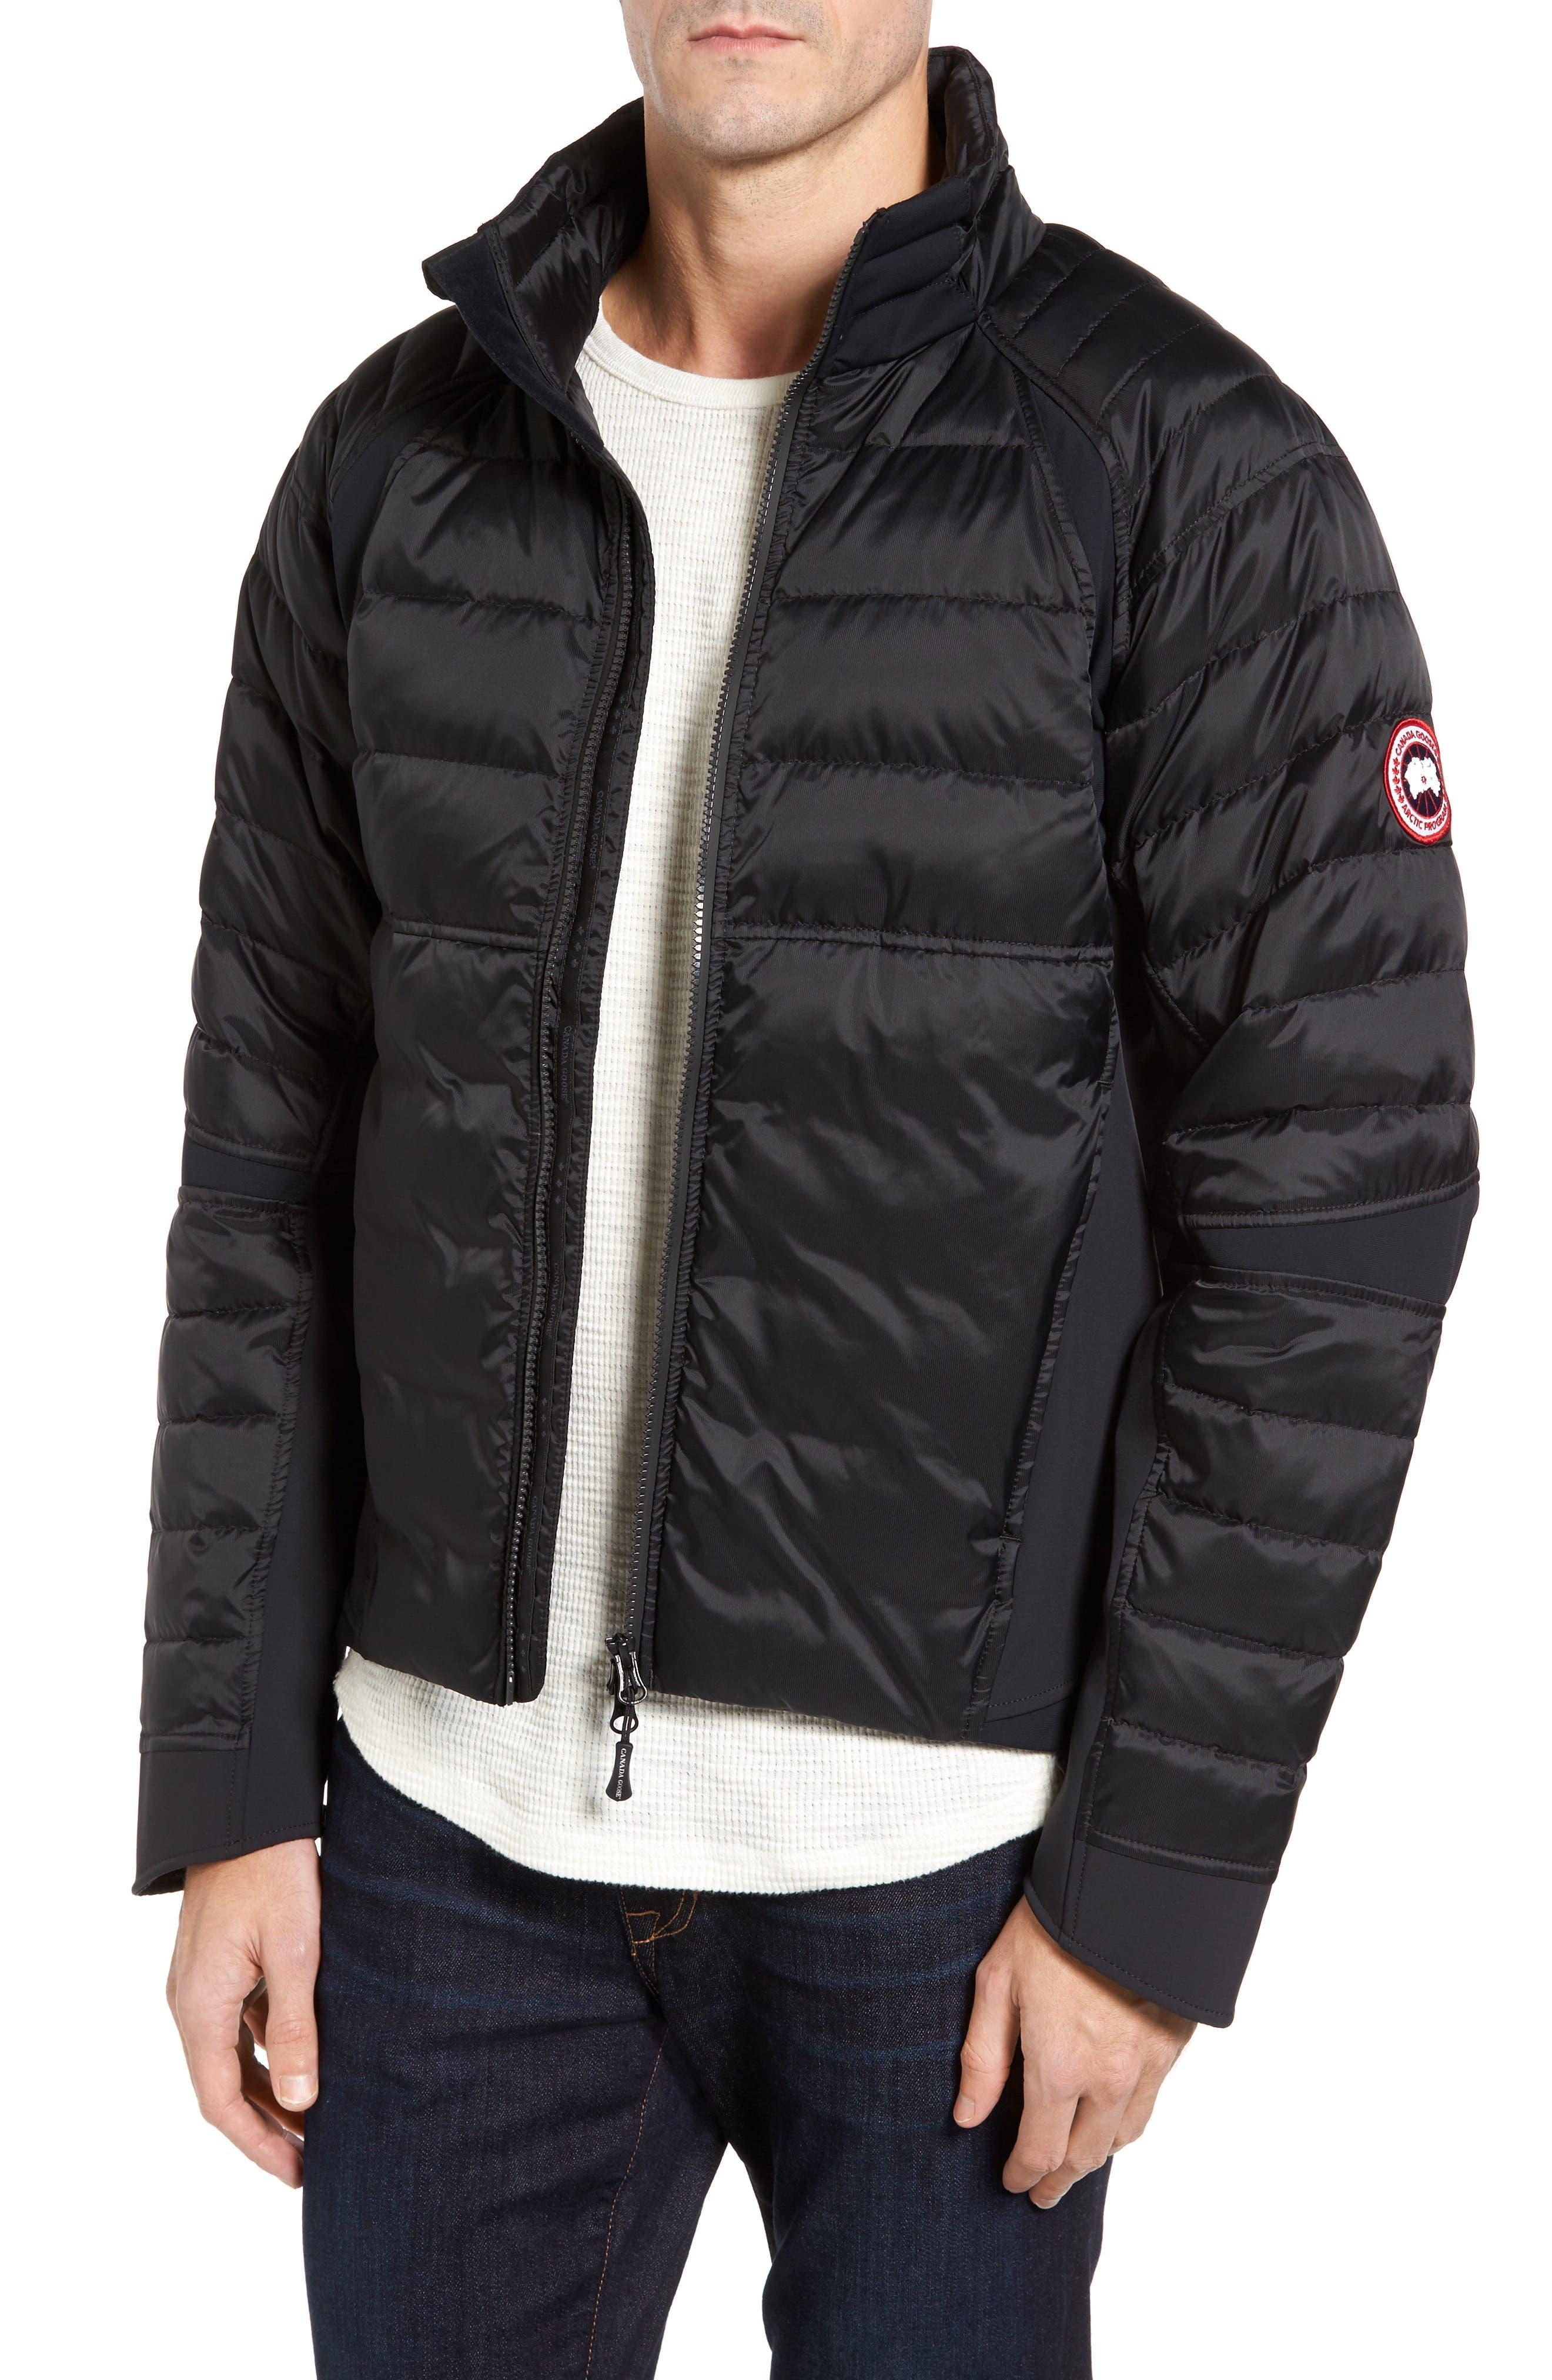 Main Image - Canada Goose HyBridge Perren Packable Down Jacket